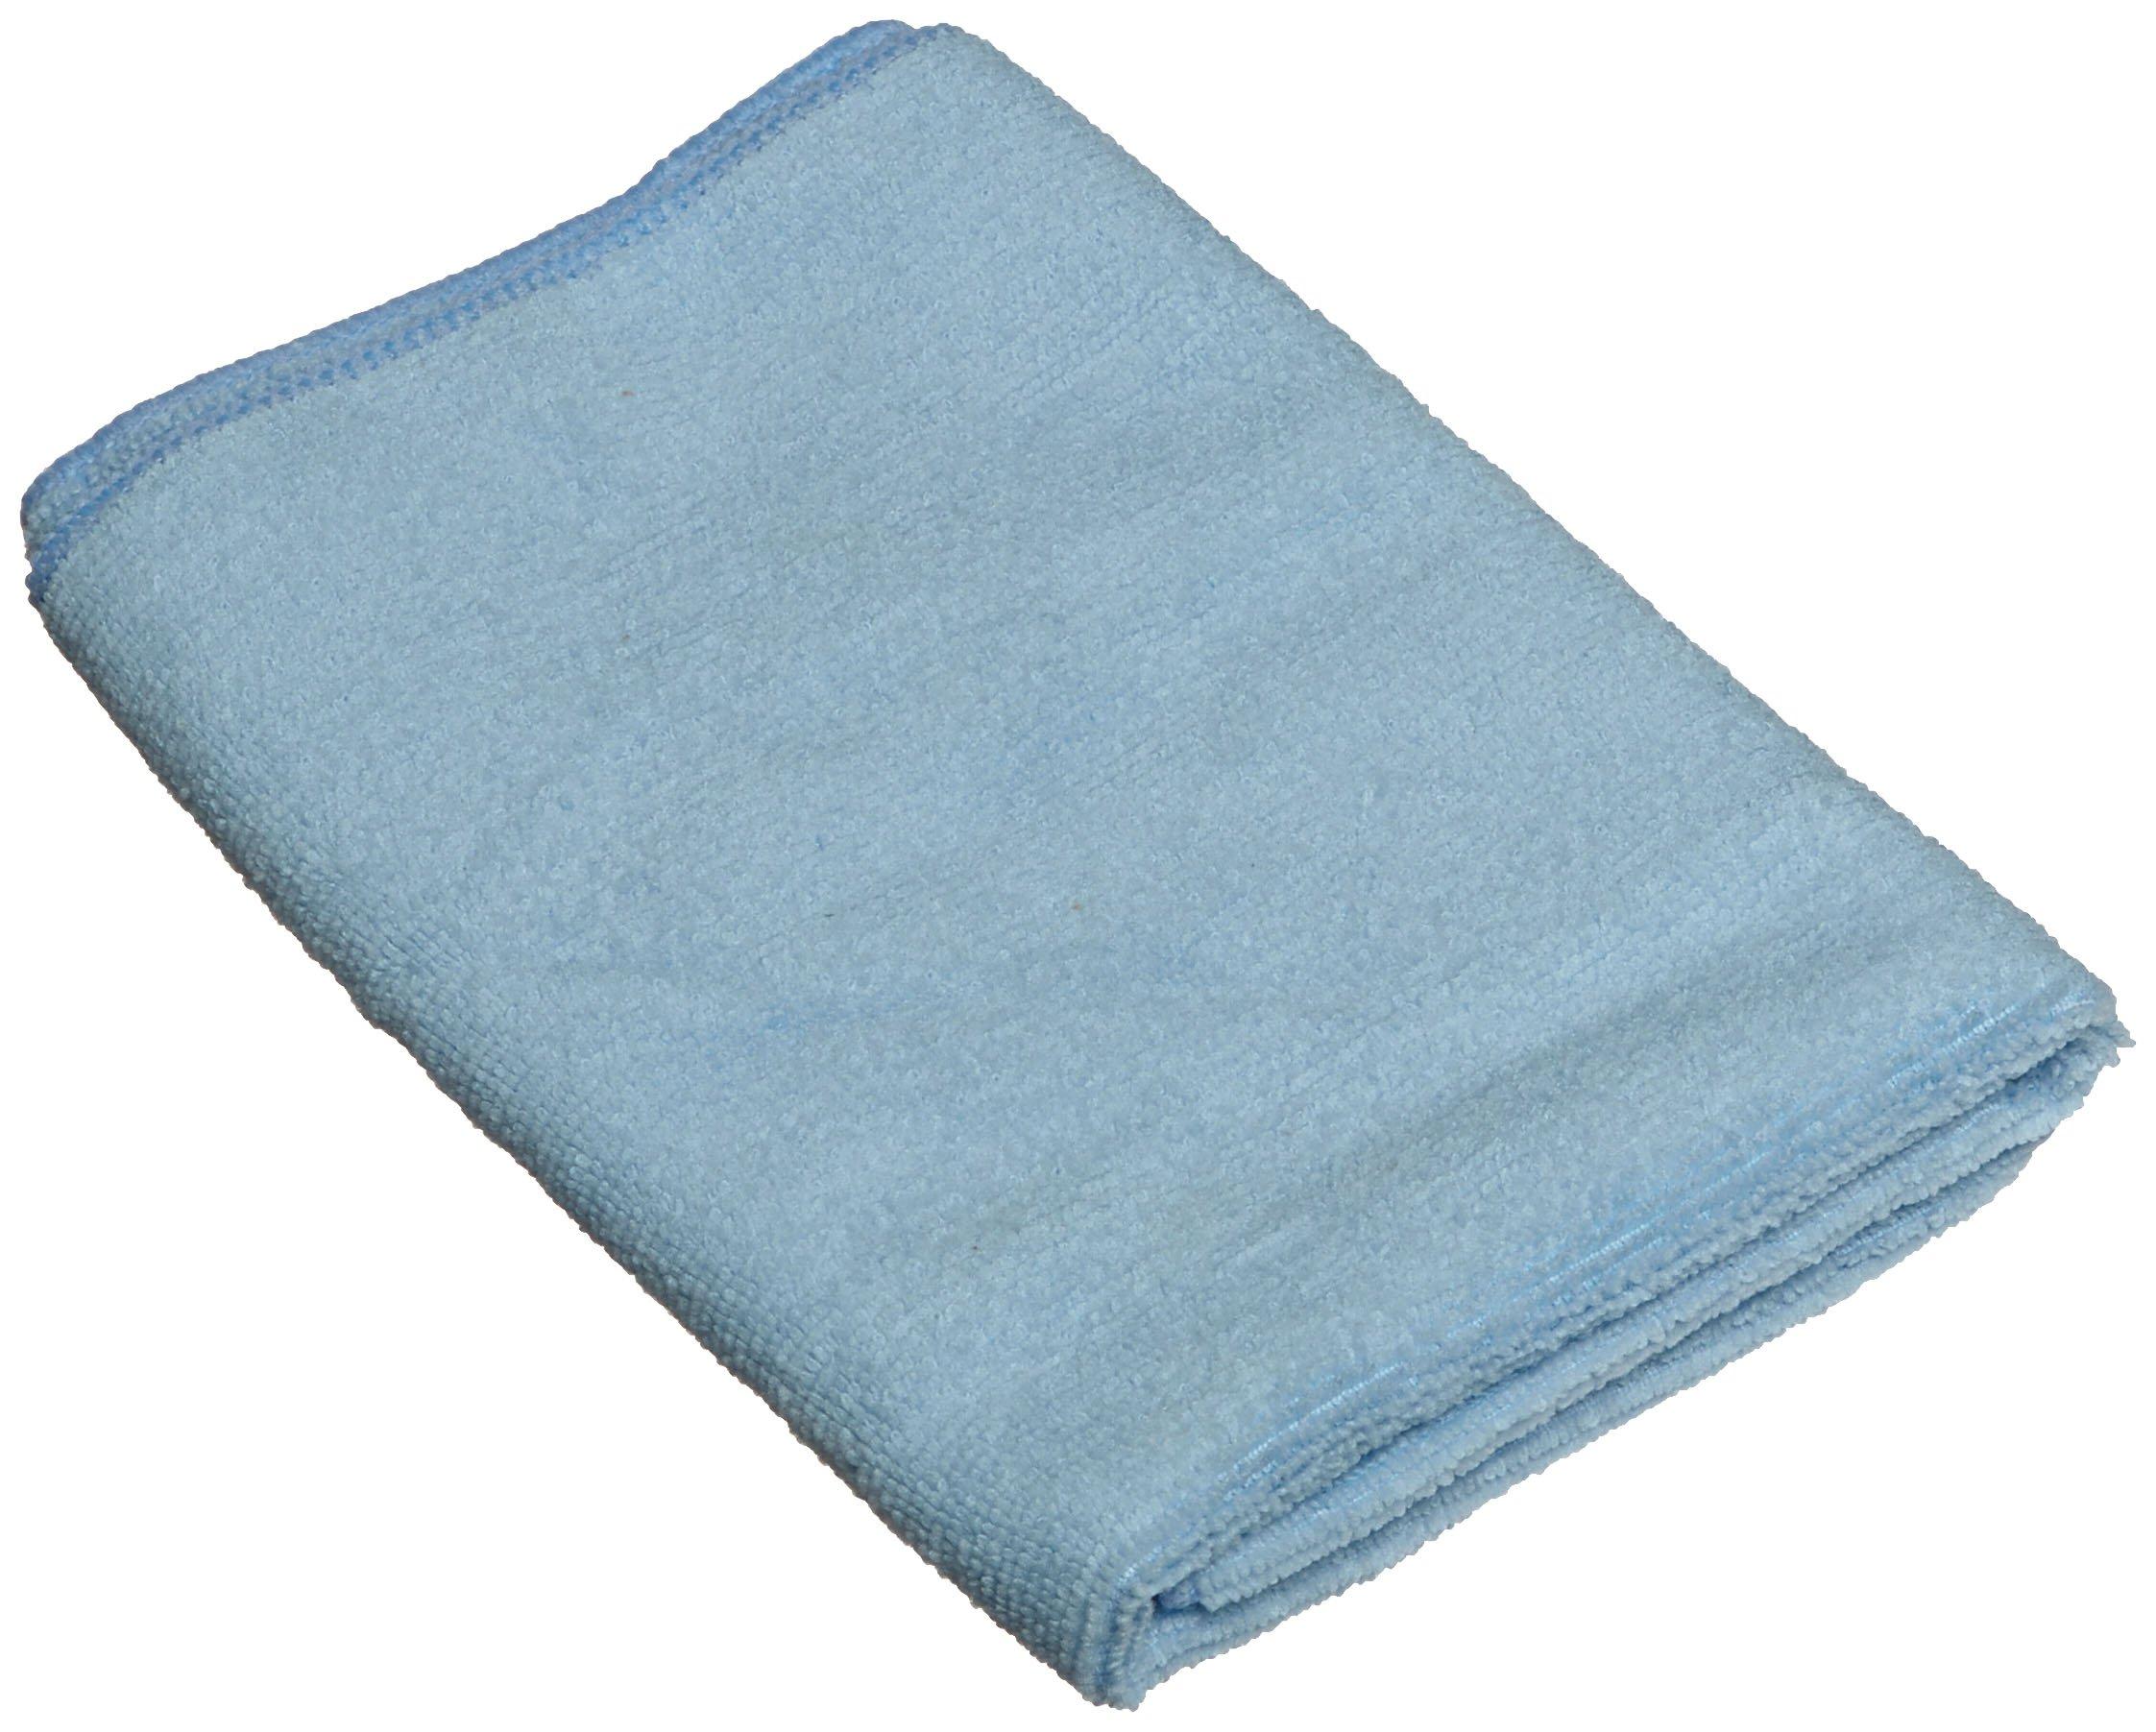 Impact LFK500 Microfiber All-Purpose Cloth, 16'' Length x 16'' Width, Blue (15 Bags of 12)